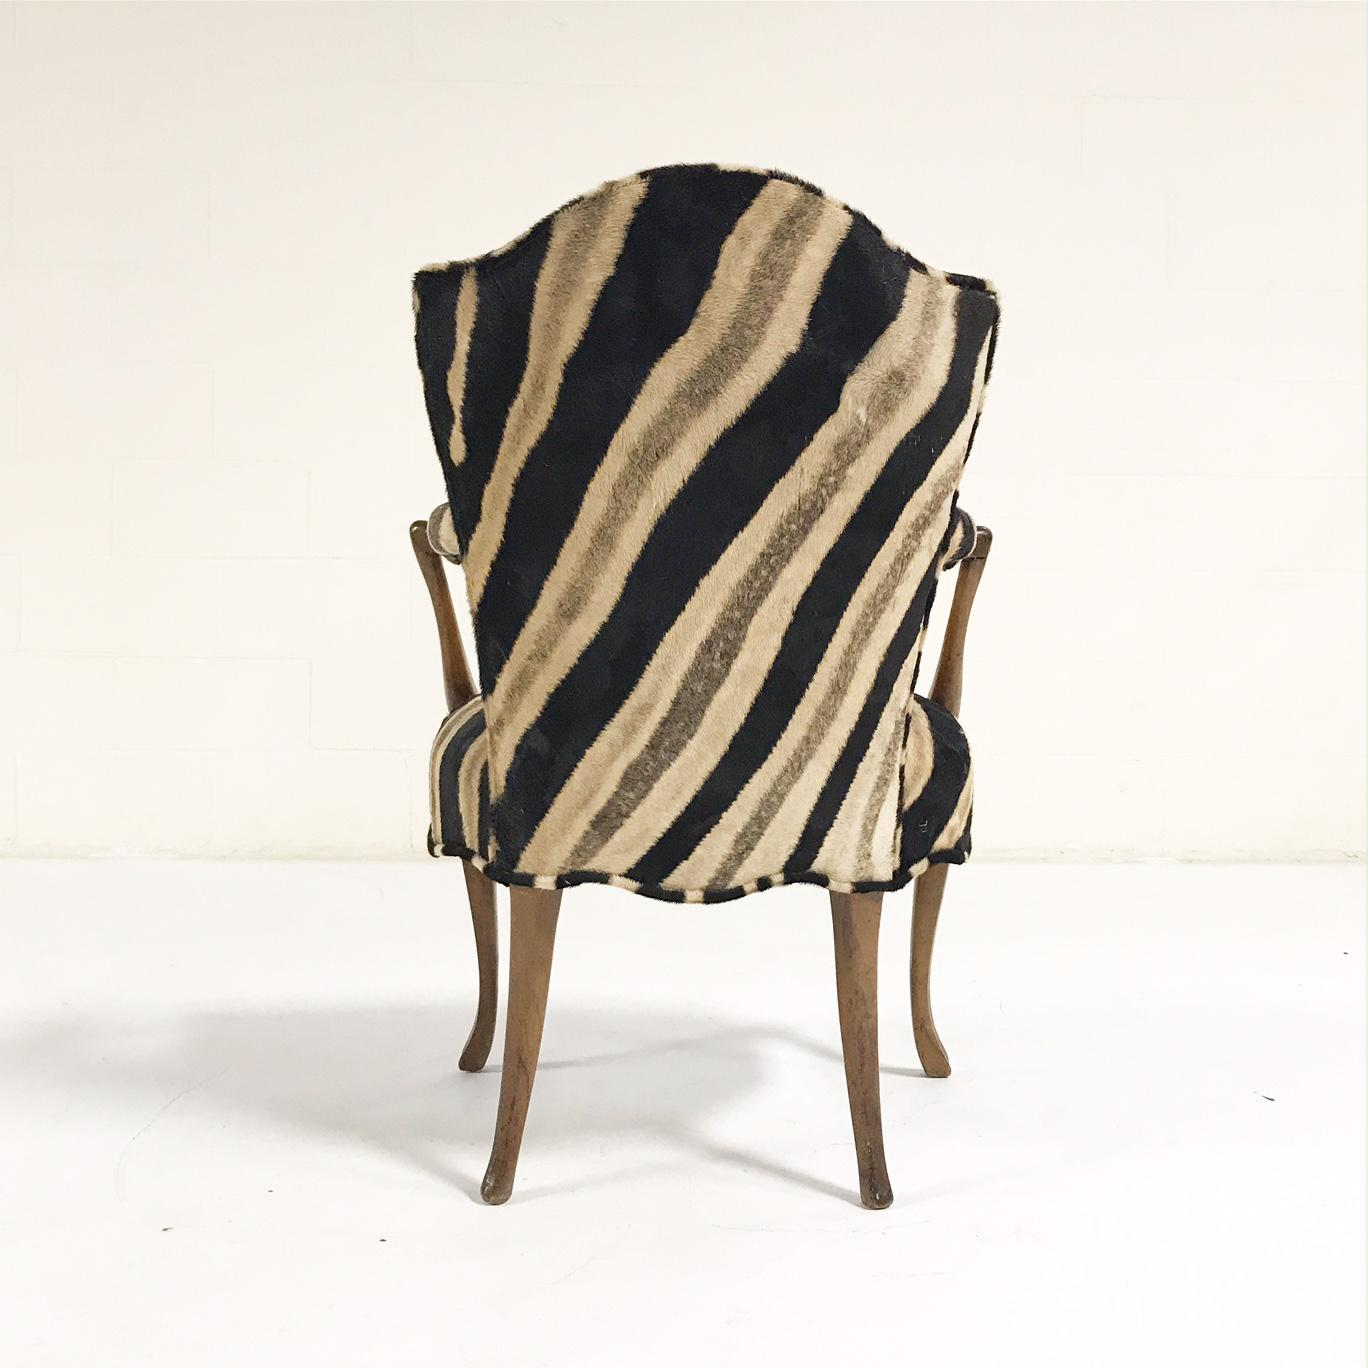 Vintage Wooden Armchair Restored In Zebra Hide   Image 7 Of 11